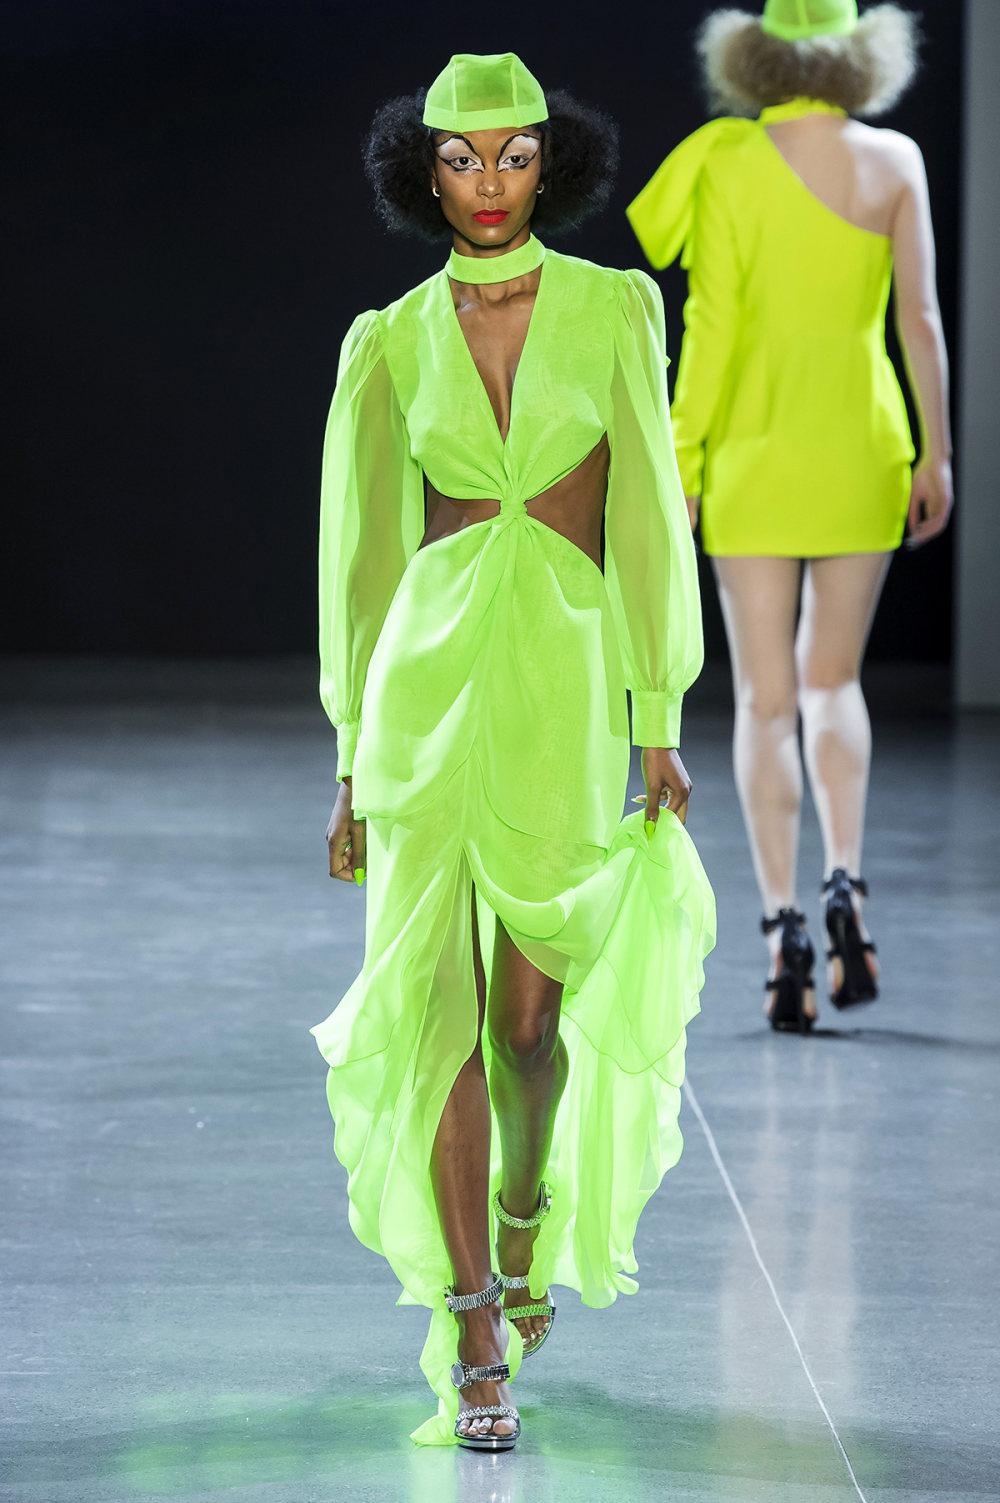 Christian Cowan时装系列虽然巨大的薄纱层状服装并没有那么特别-30.jpg